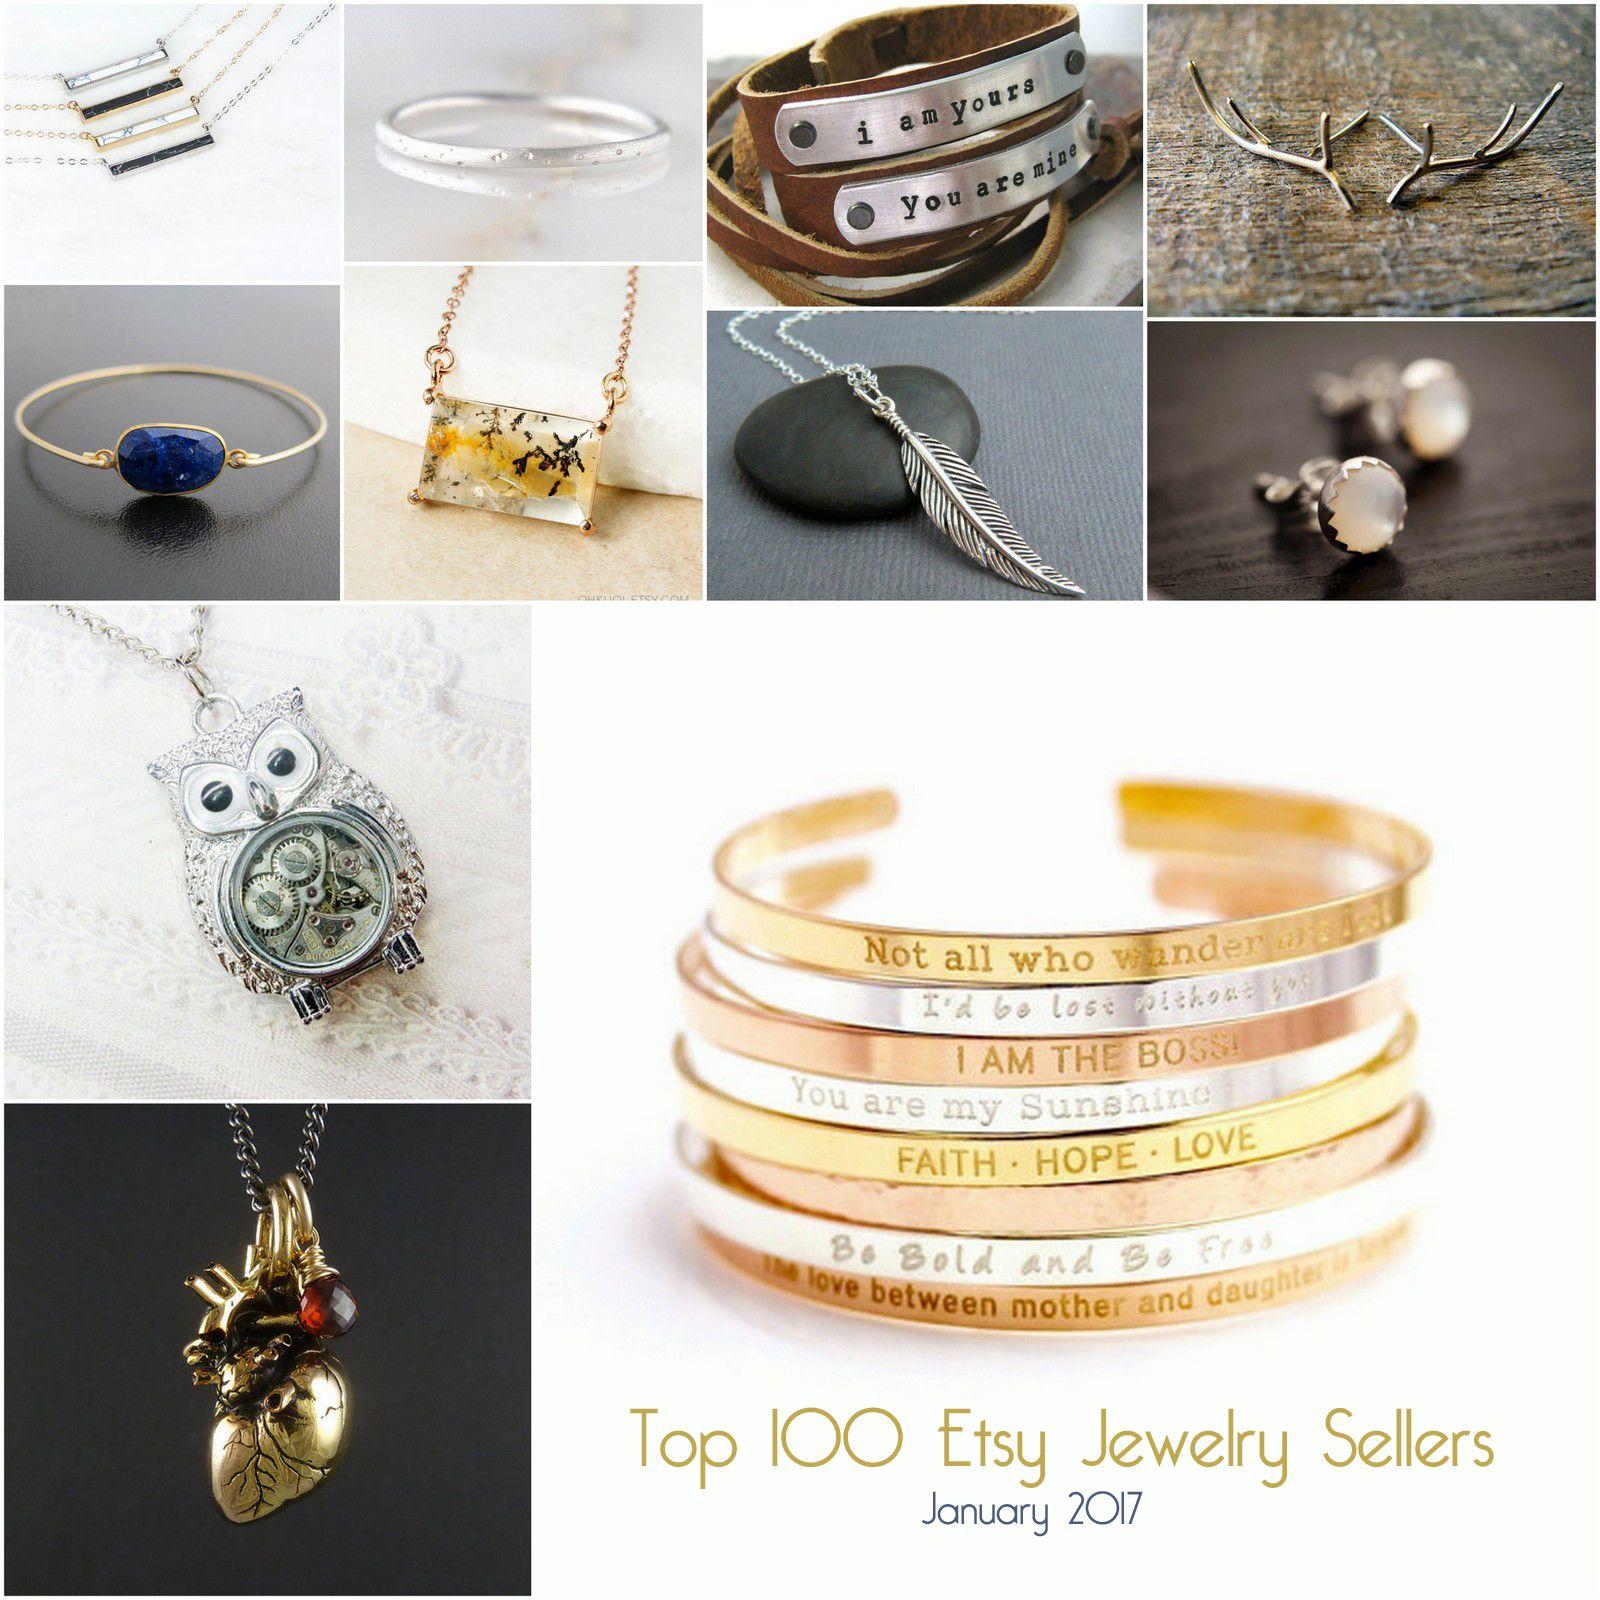 ec3e01e060699 top sellers | Blogs to go back to | Pinterest | Etsy